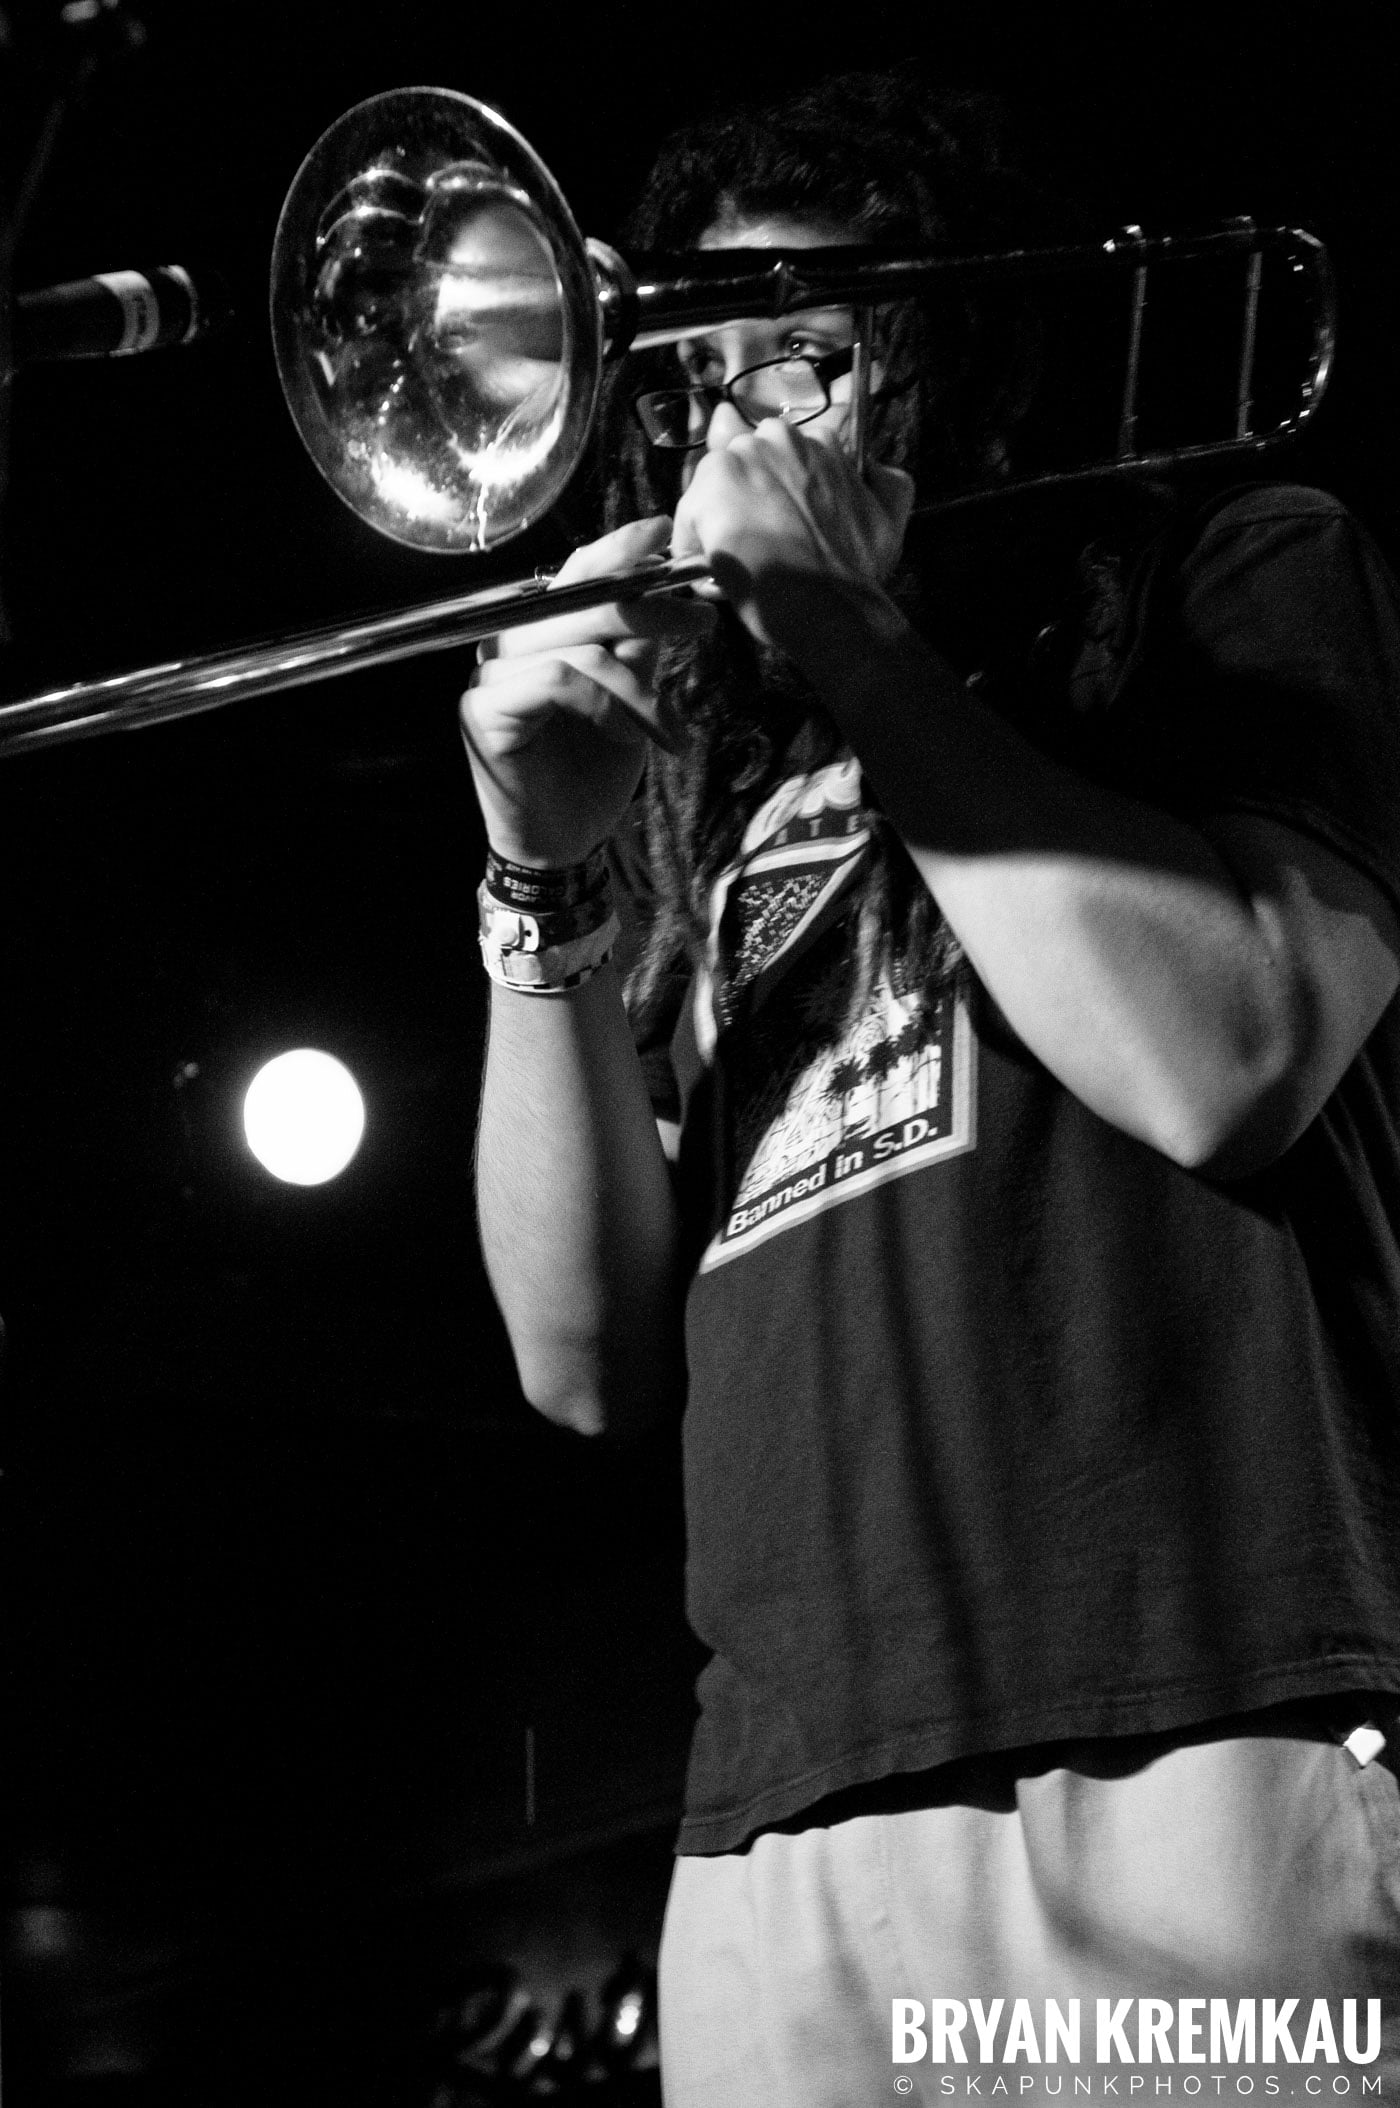 Voodoo Glow Skulls (Ska is Dead Tour) @ Starland Ballroom, Sayreville, NJ - 11.15.09 (13)